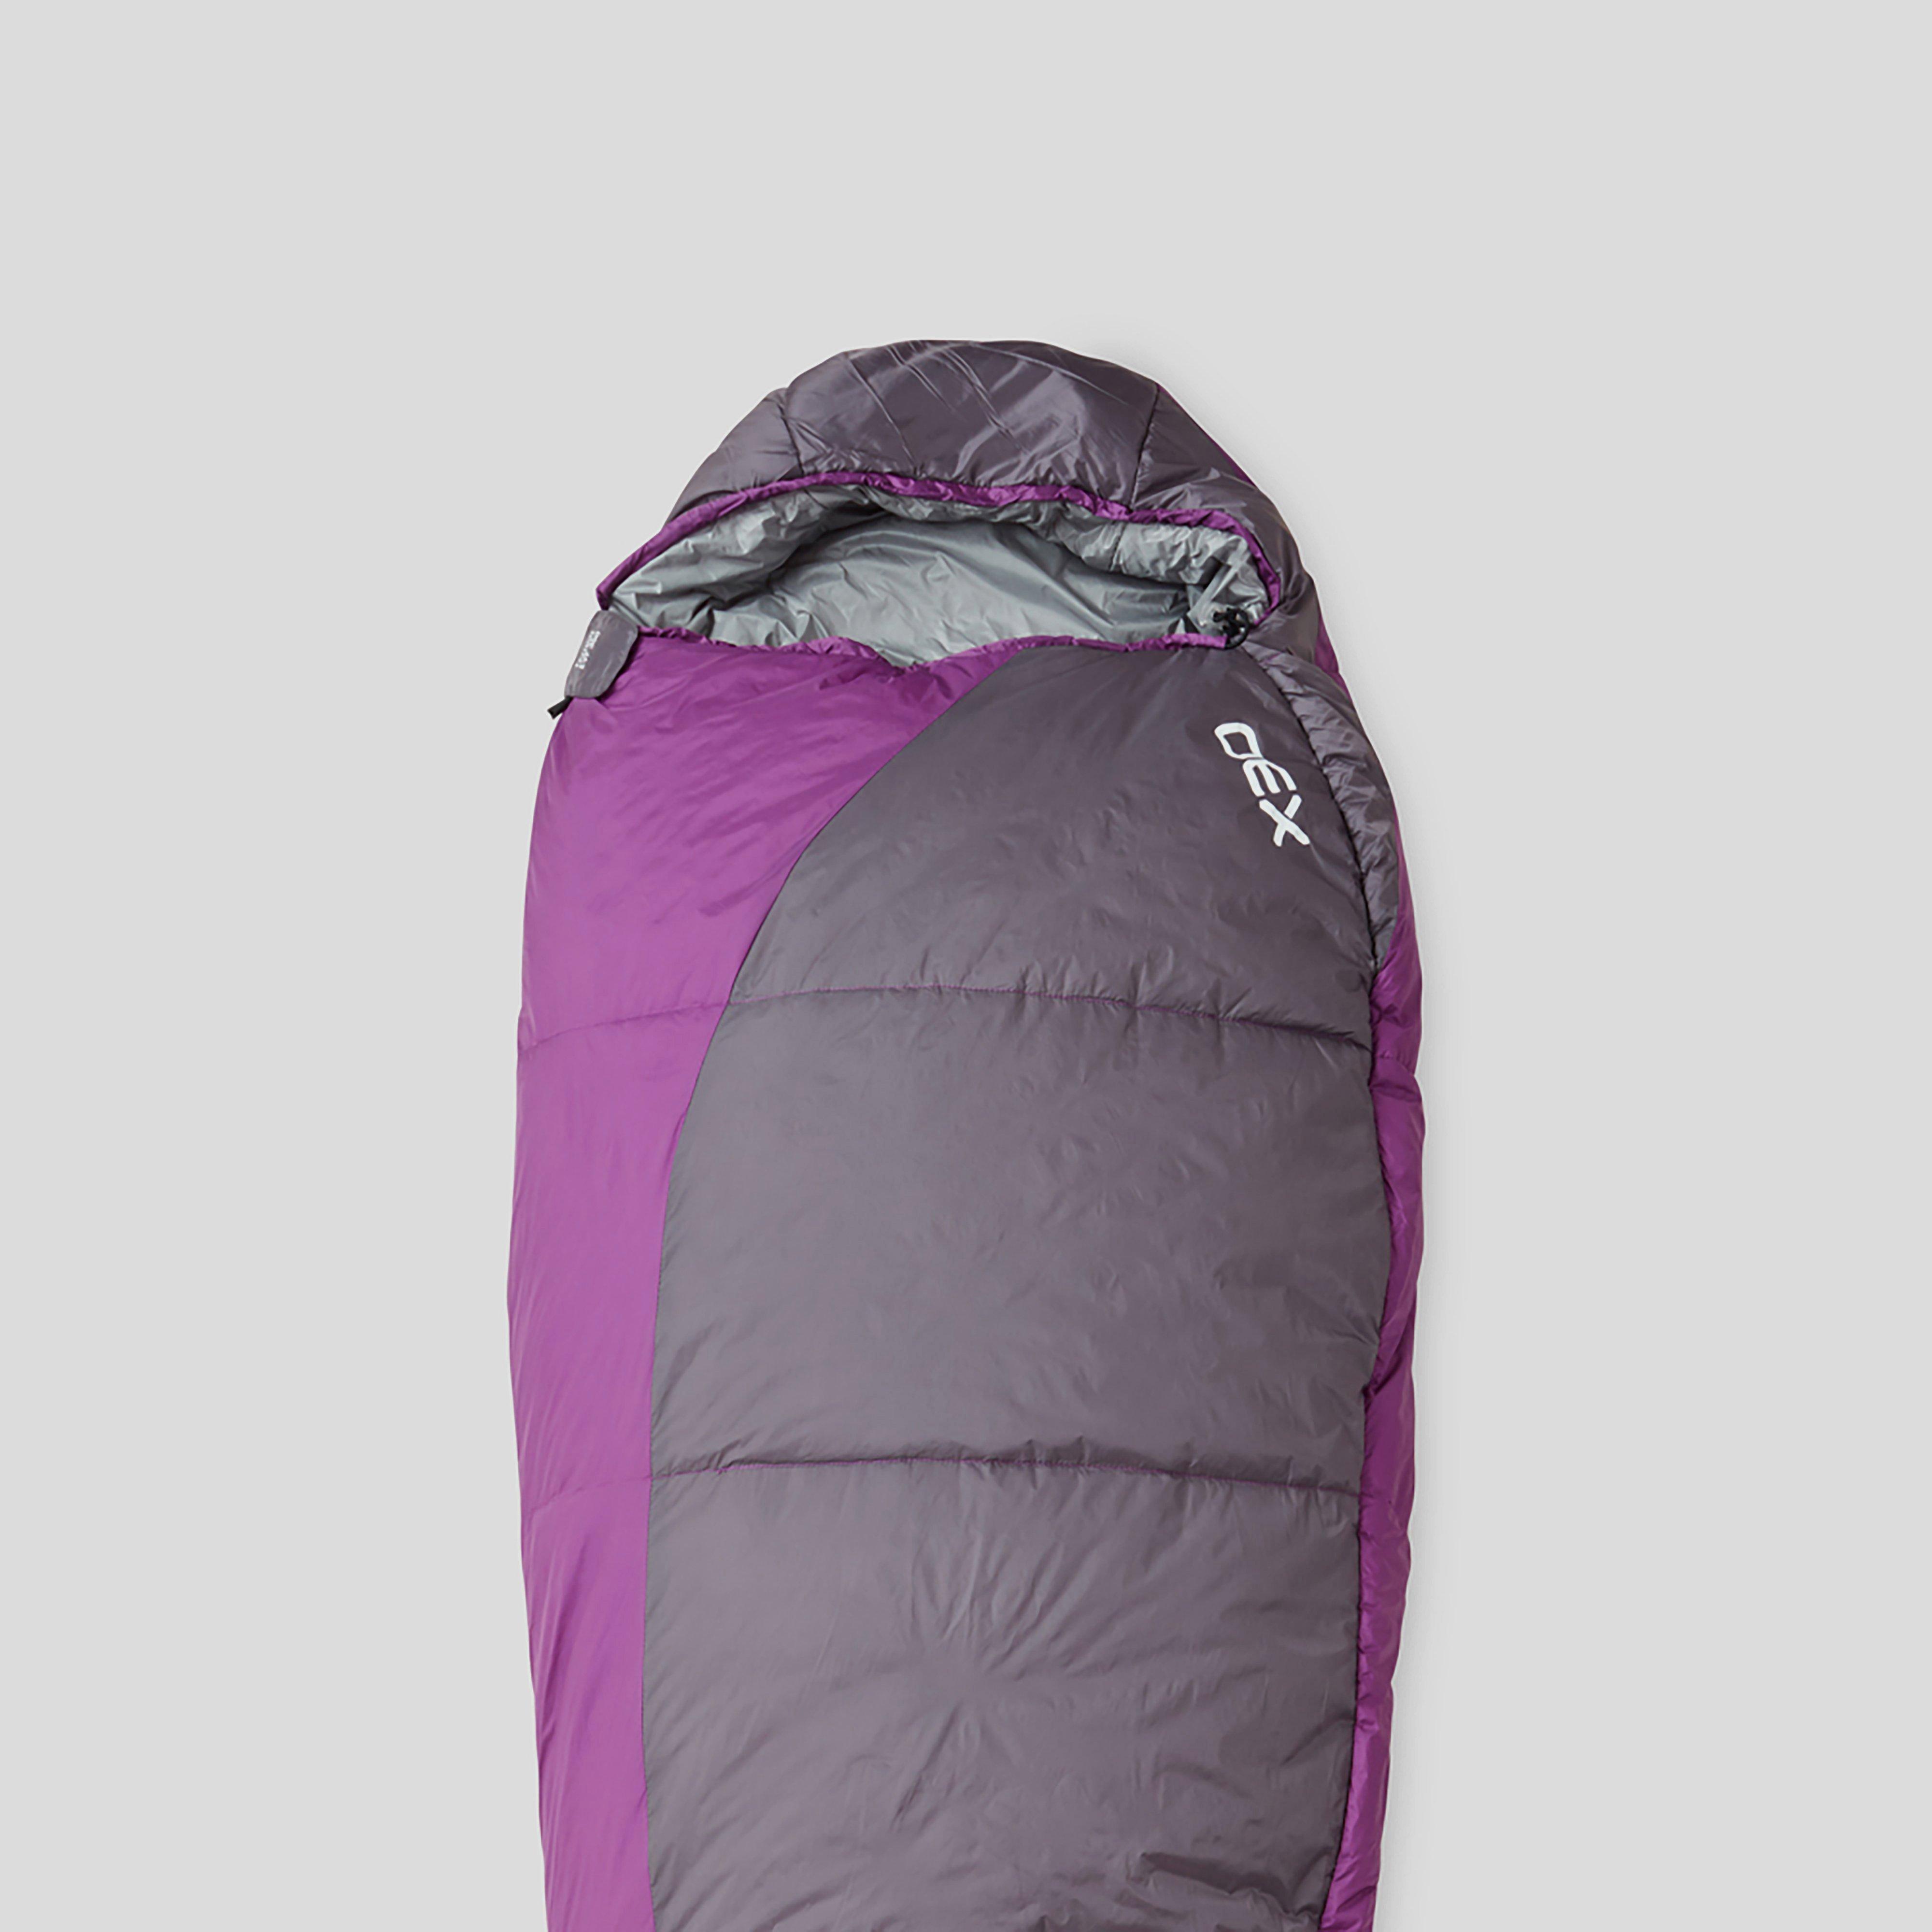 Oex Oex Fathom Evolution 350 Sleeping Bag